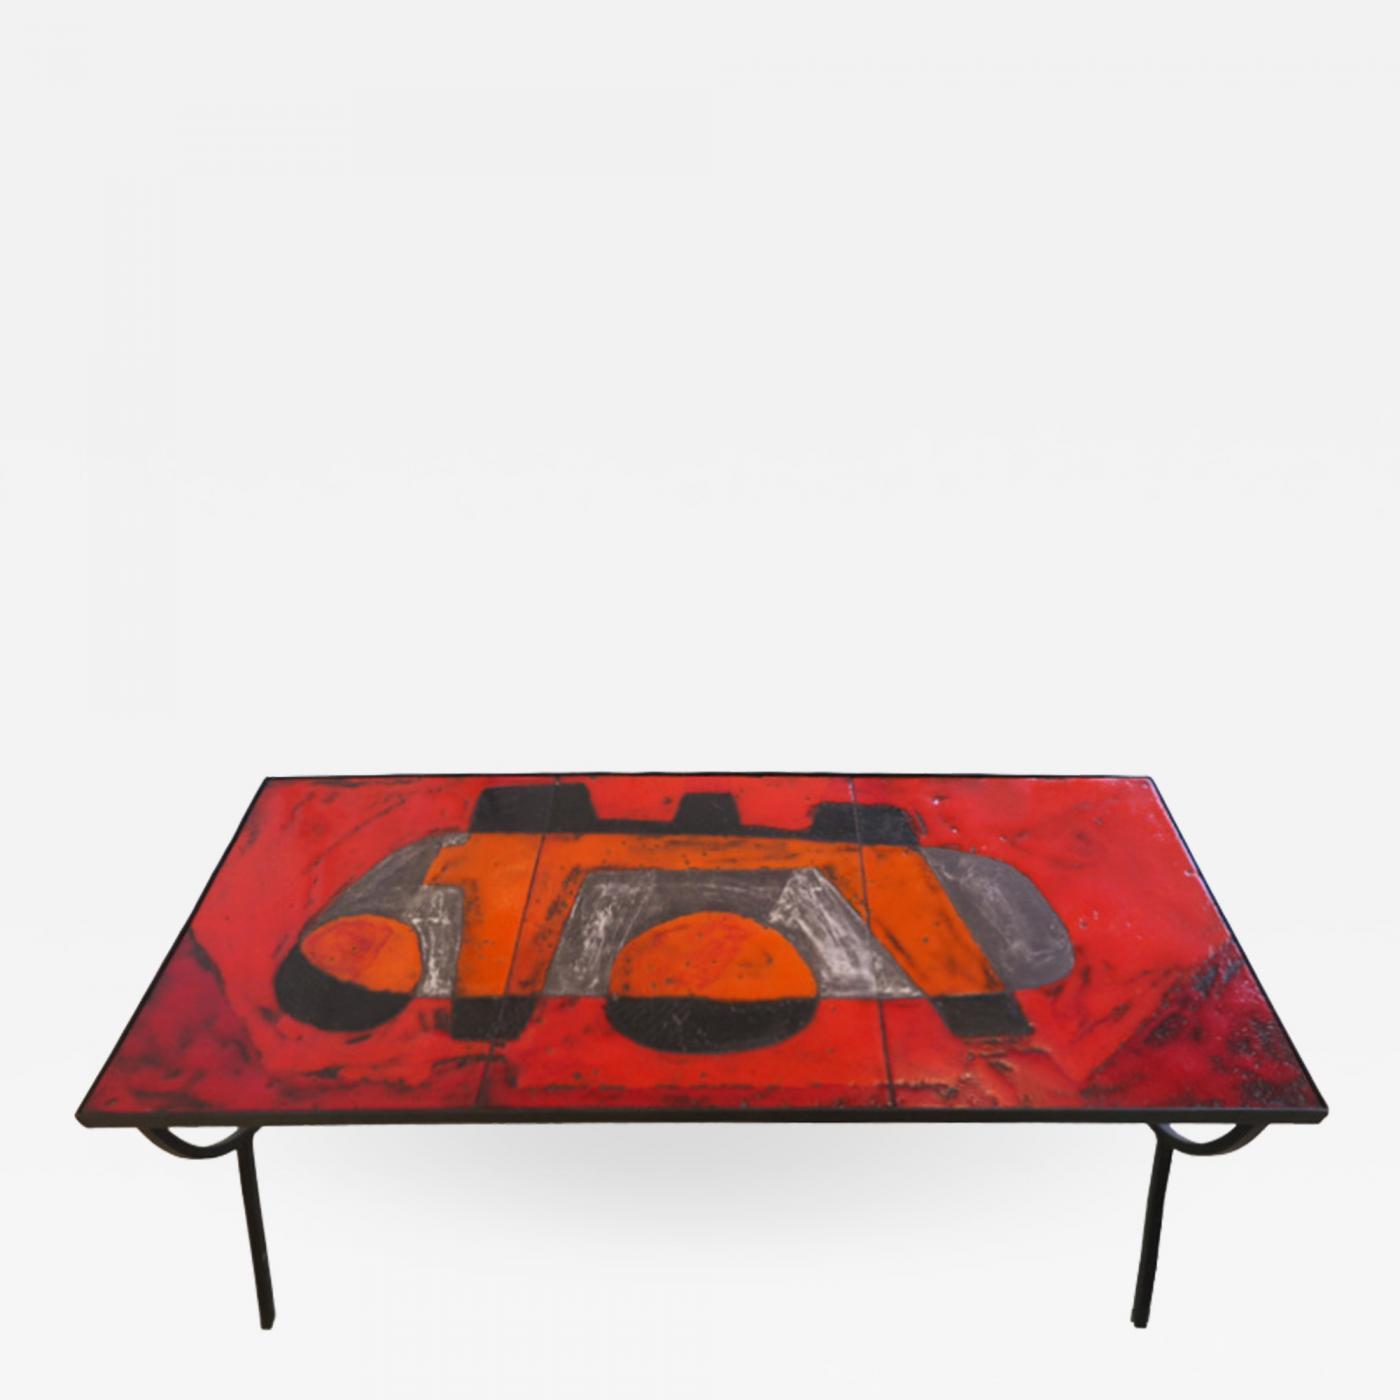 Robert jean cloutier ceramic tile coffee table by cloutier listings furniture tables coffee tables robert jean cloutier ceramic tile dailygadgetfo Gallery